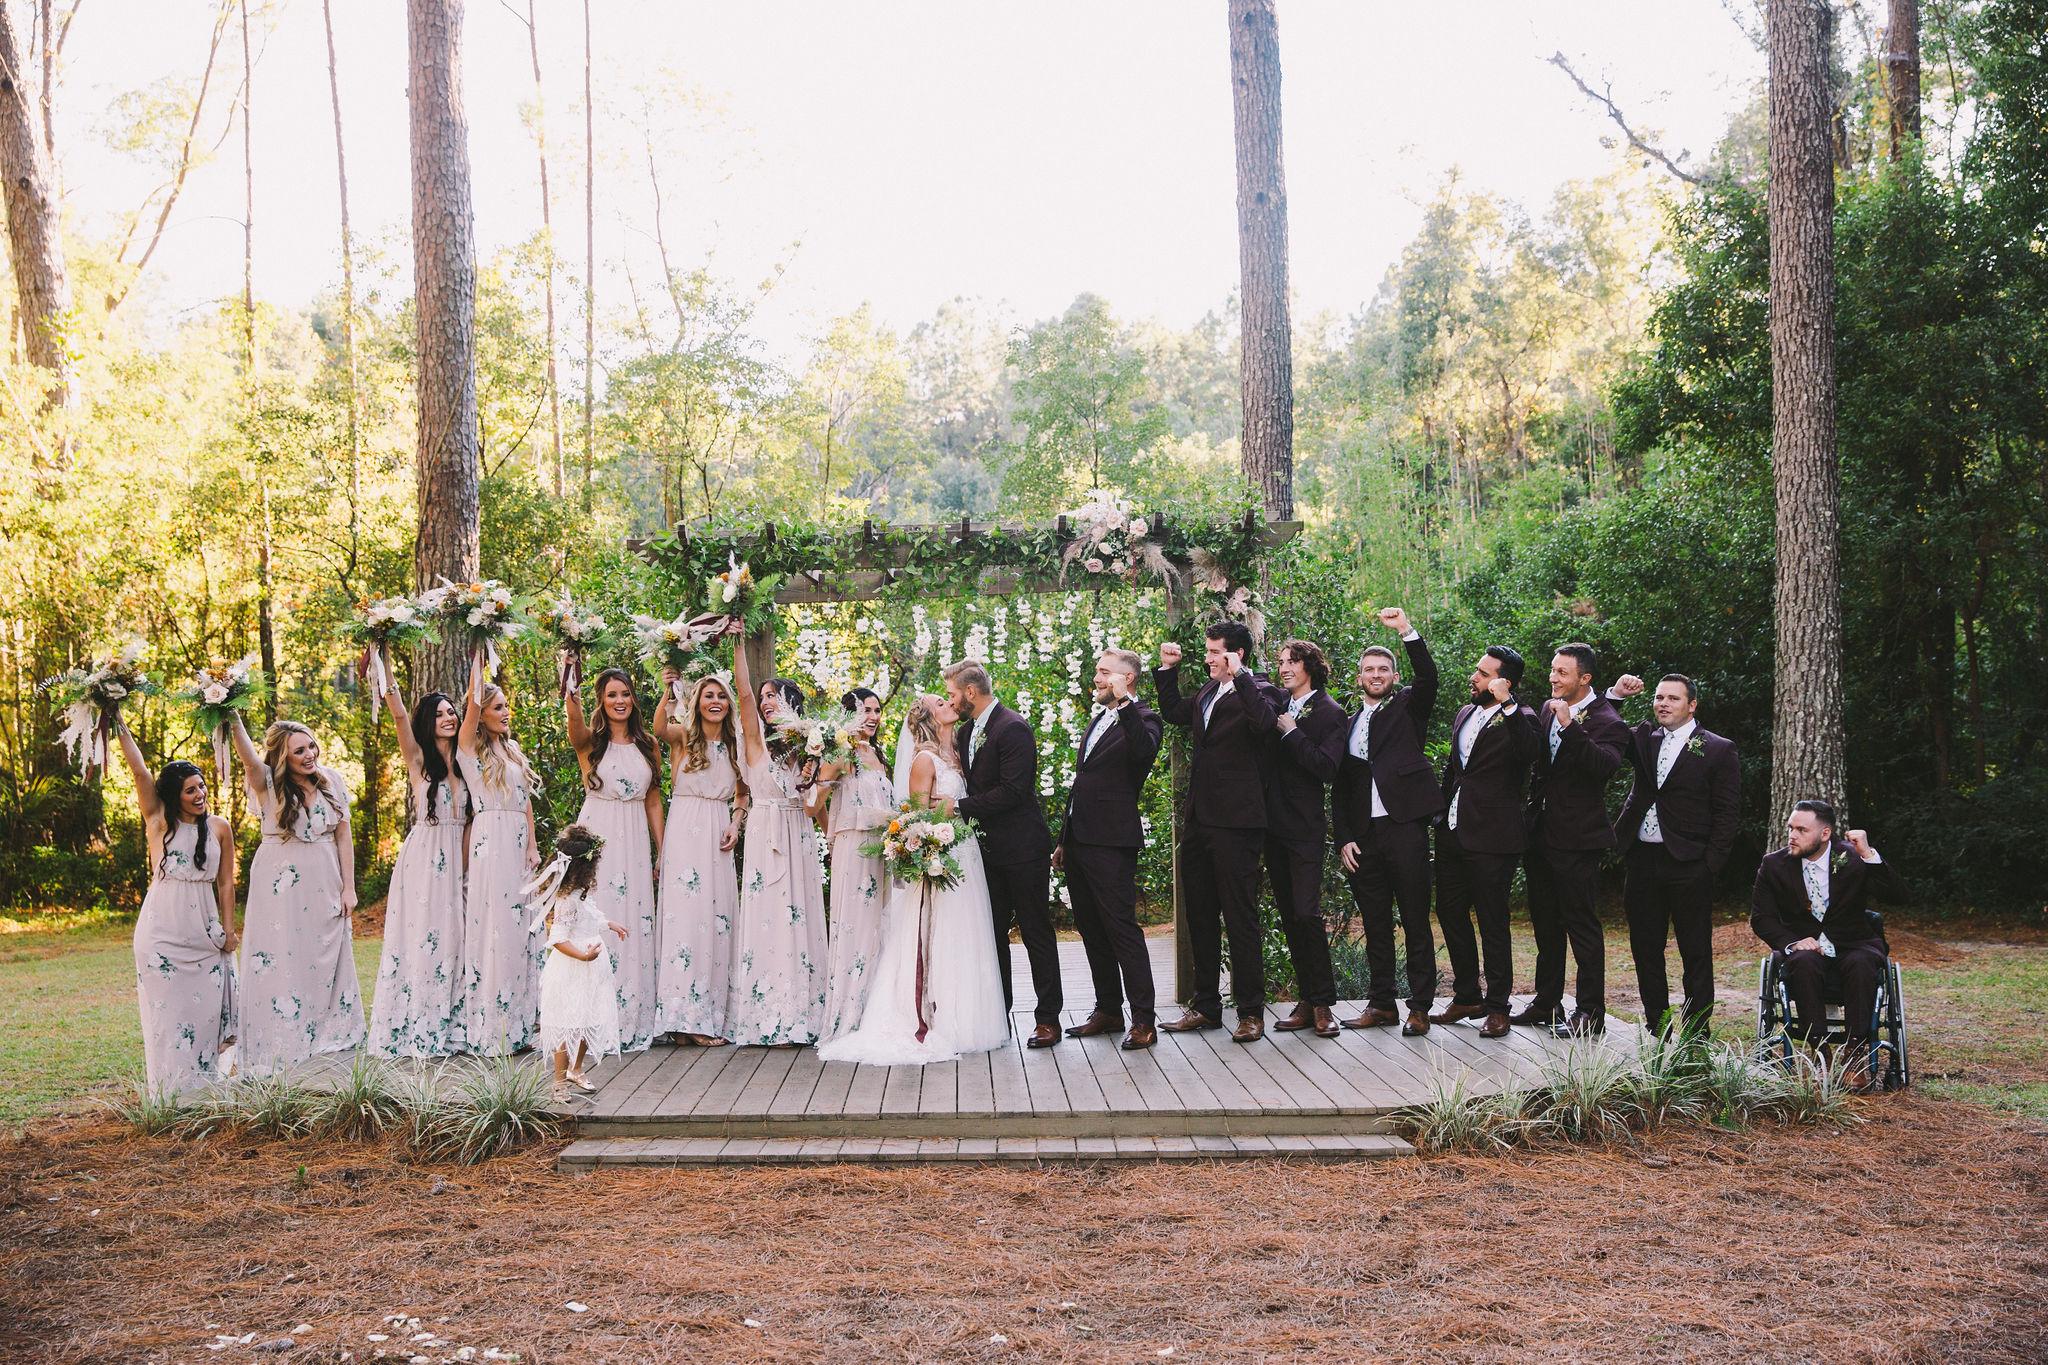 Jesseandlex_181103_AlexisNate_Wedding_BridalParty_004.jpg